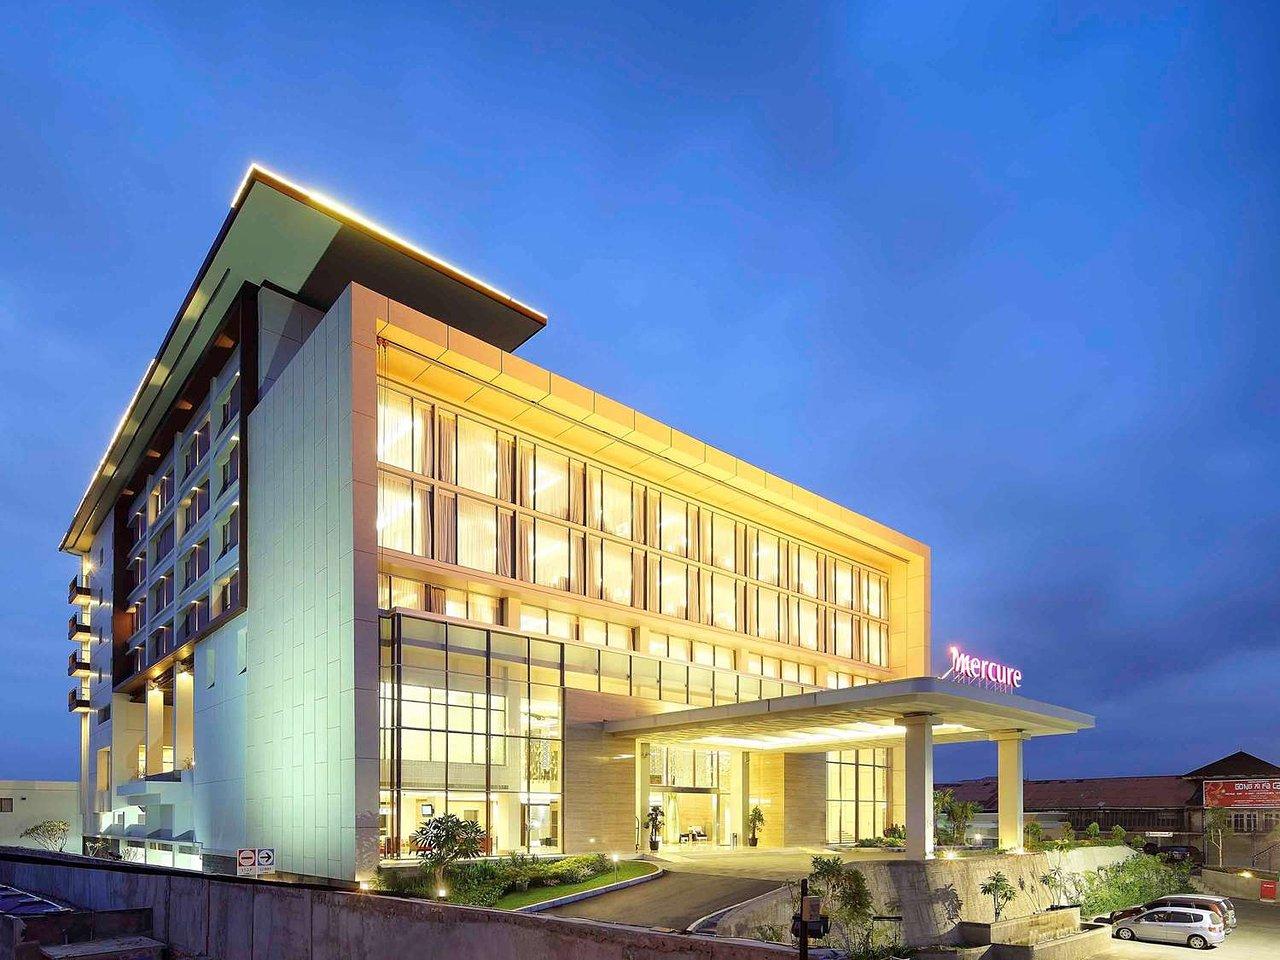 mercure padang 53 7 4 updated 2019 prices hotel reviews rh tripadvisor com